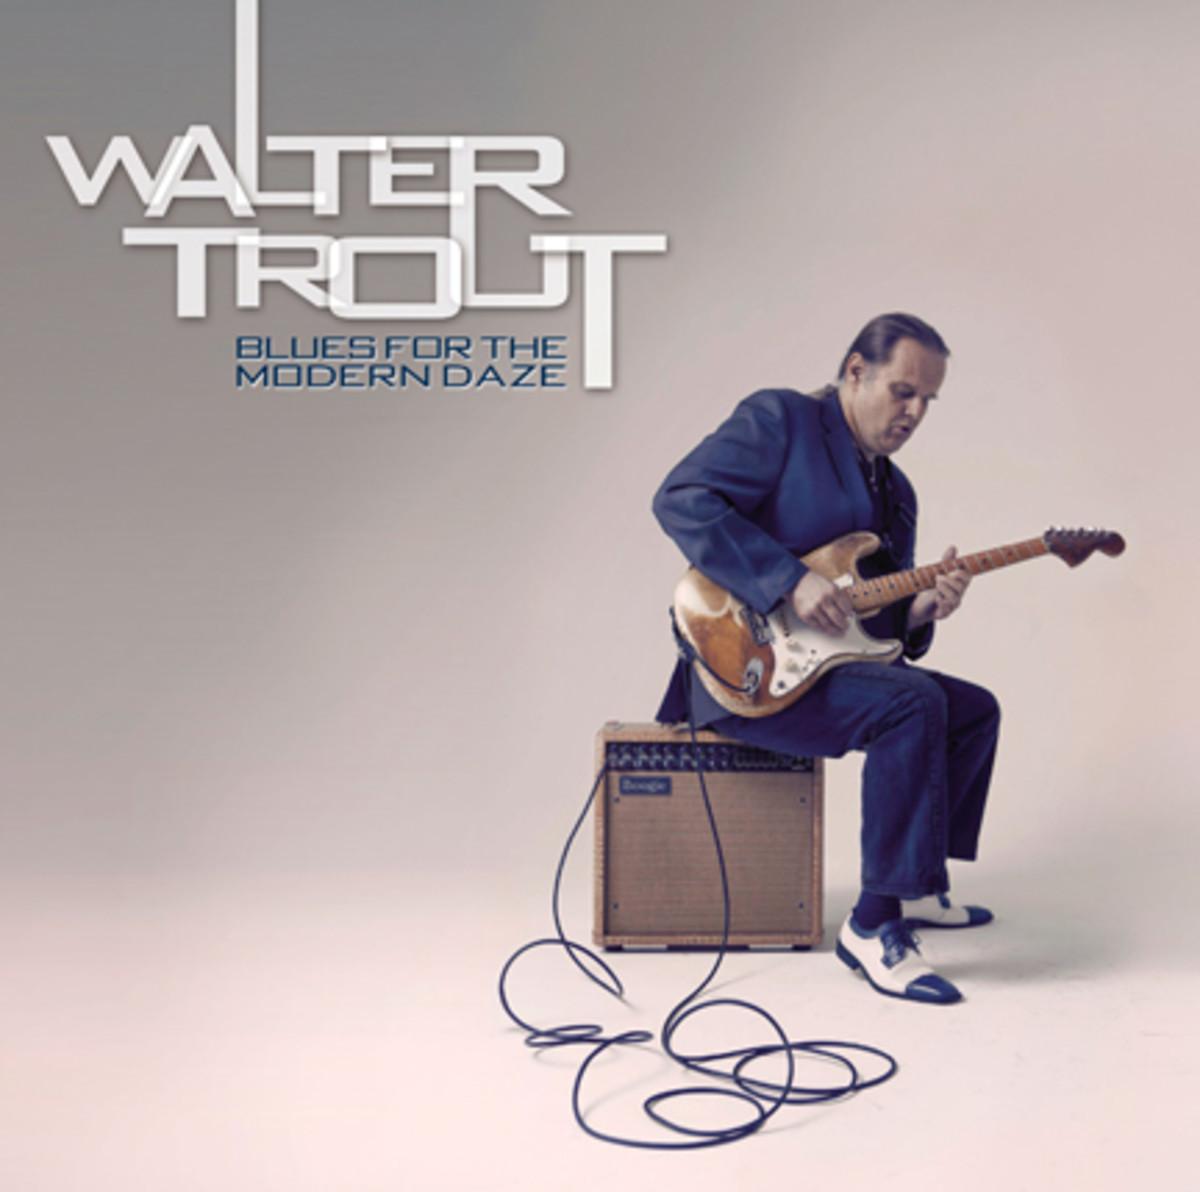 WalterTrout_BluesForTheModernDaze